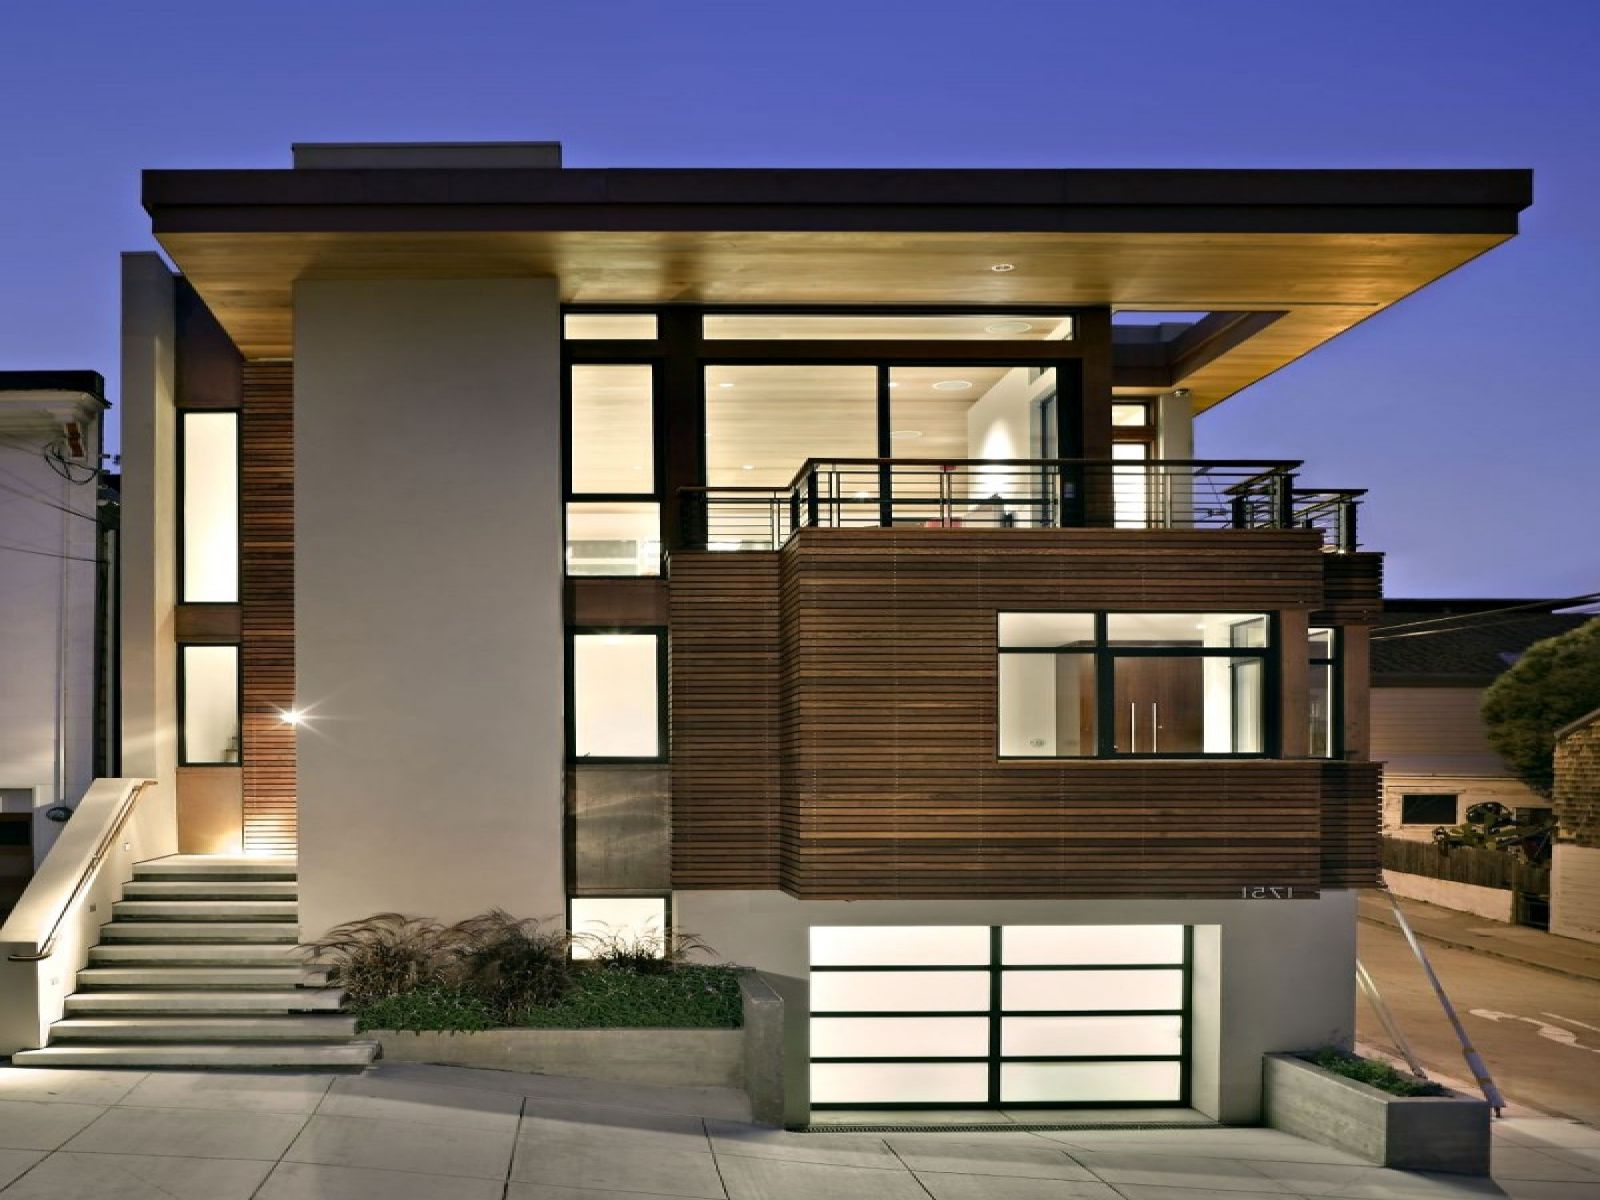 60 Desain Idaman Rumah Modern Masa Kini Rumahku Unik